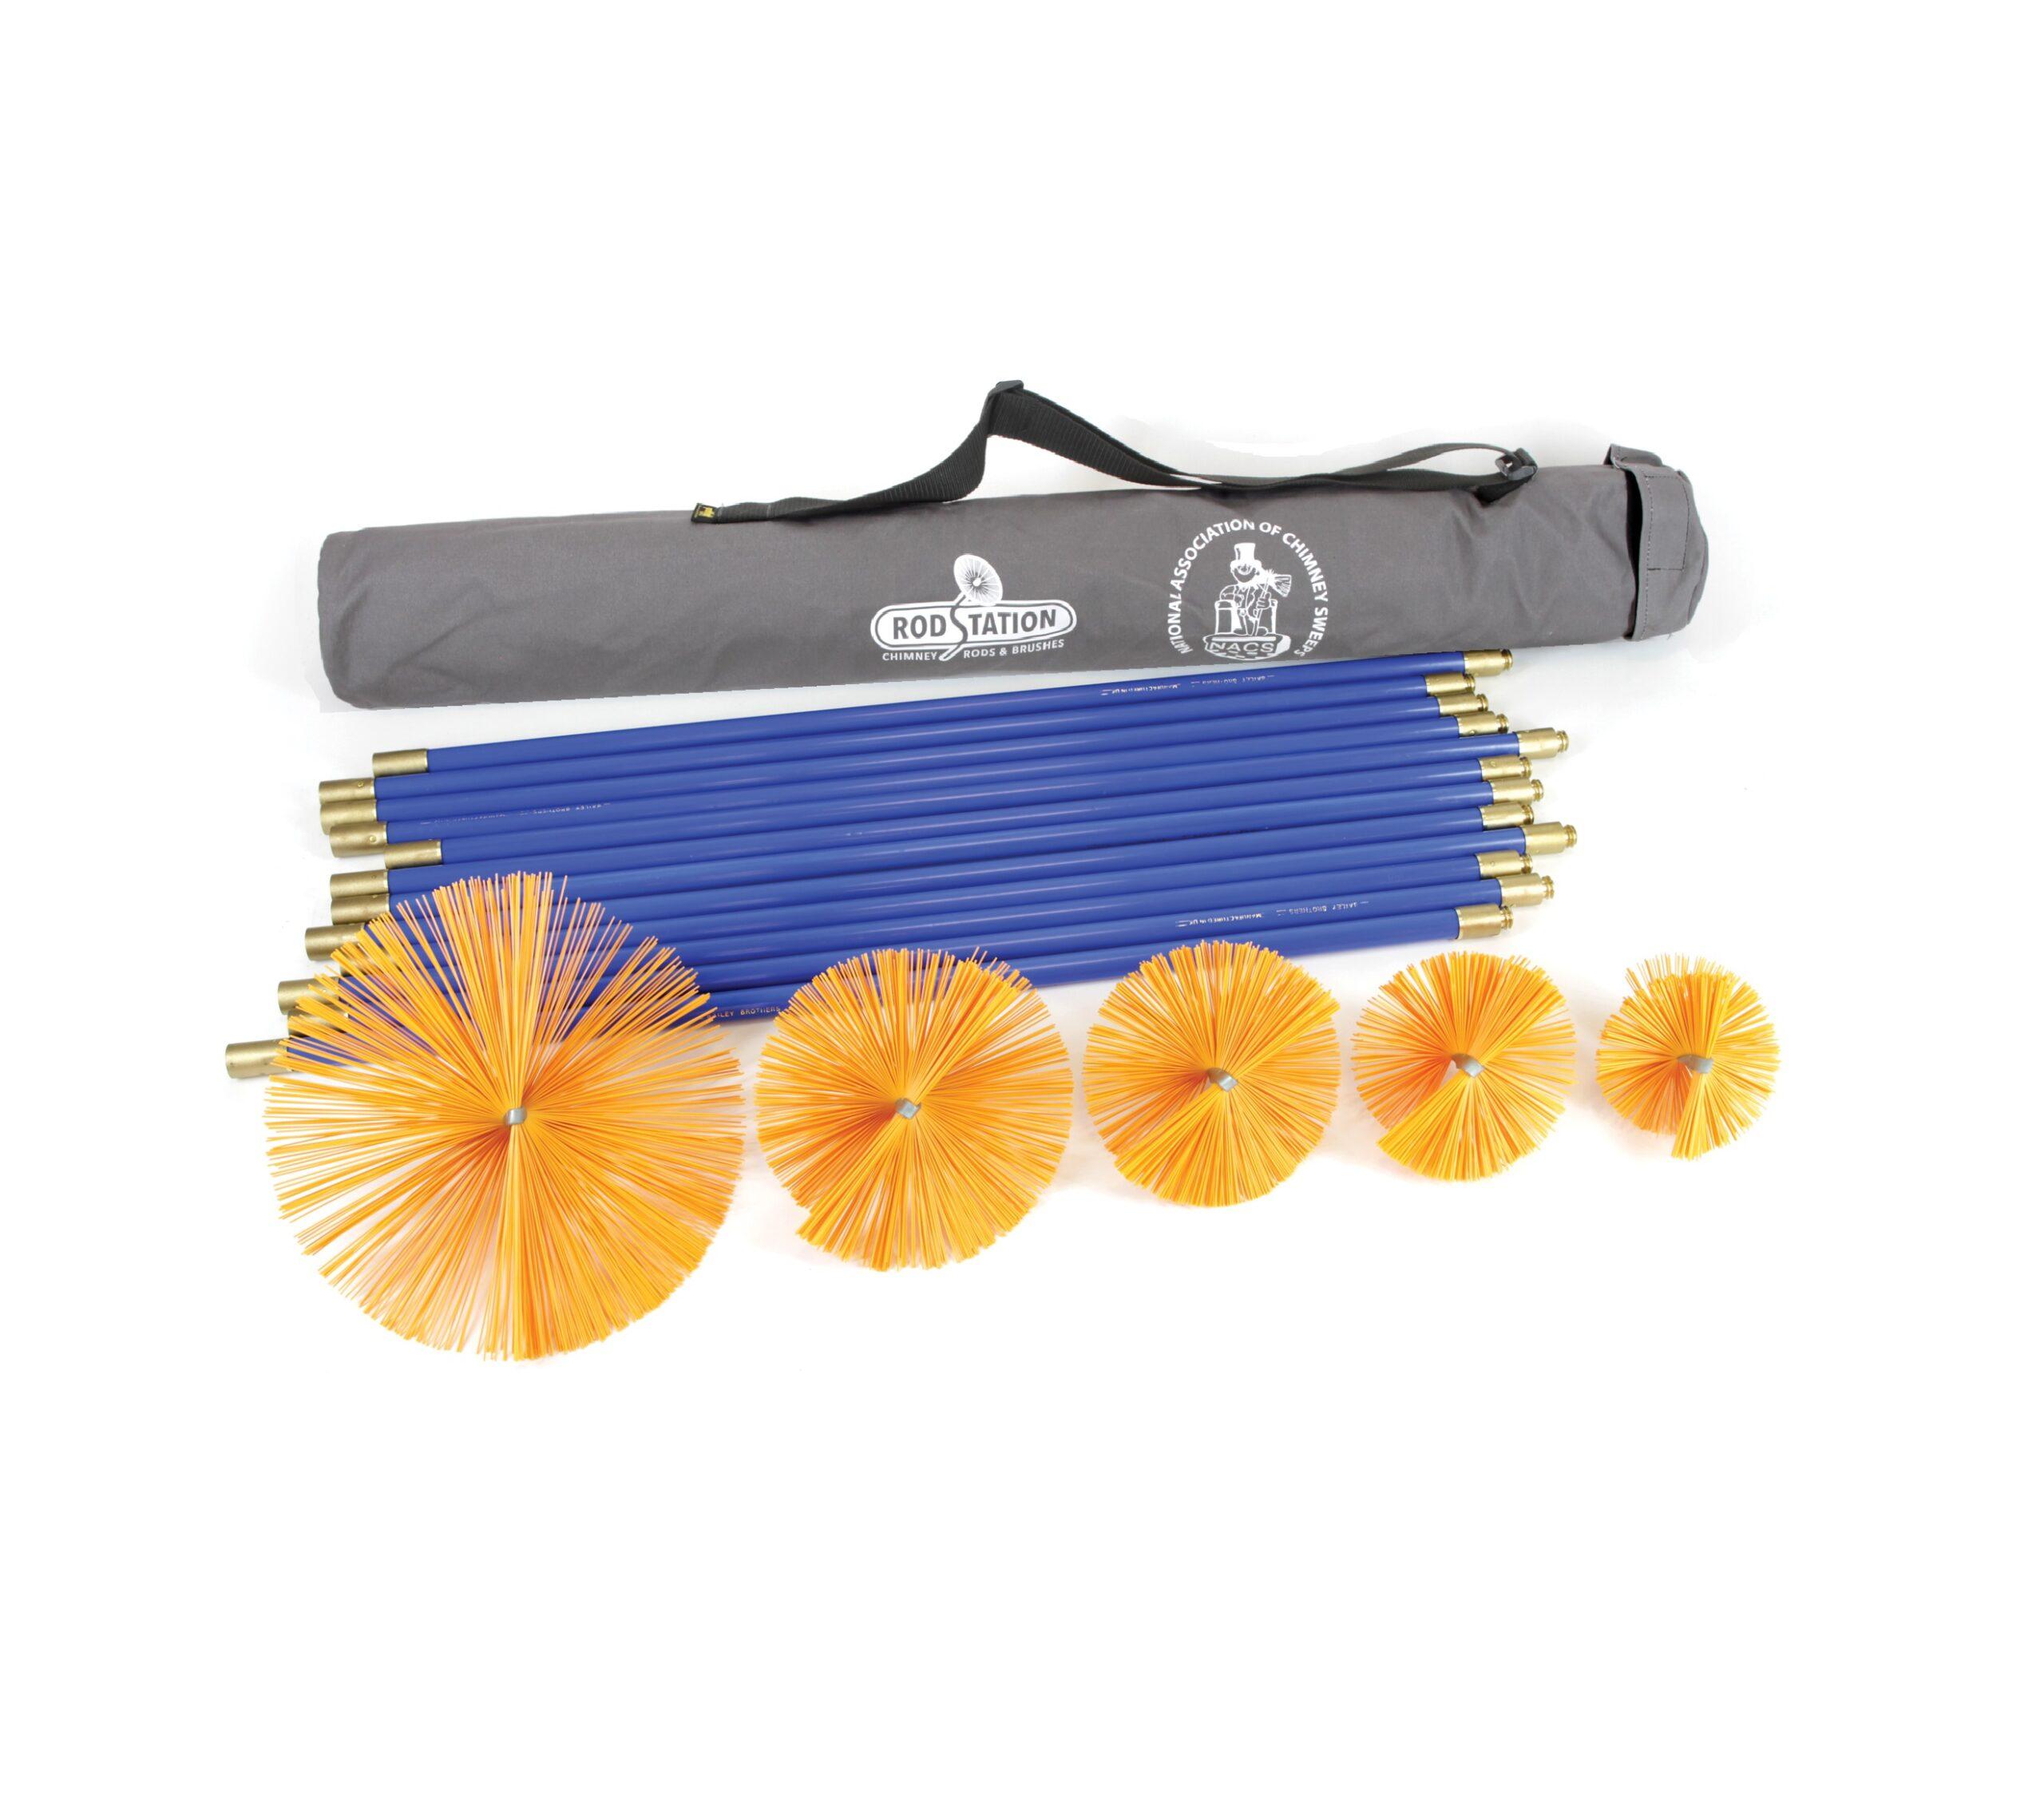 Nacs chimney sweep kit